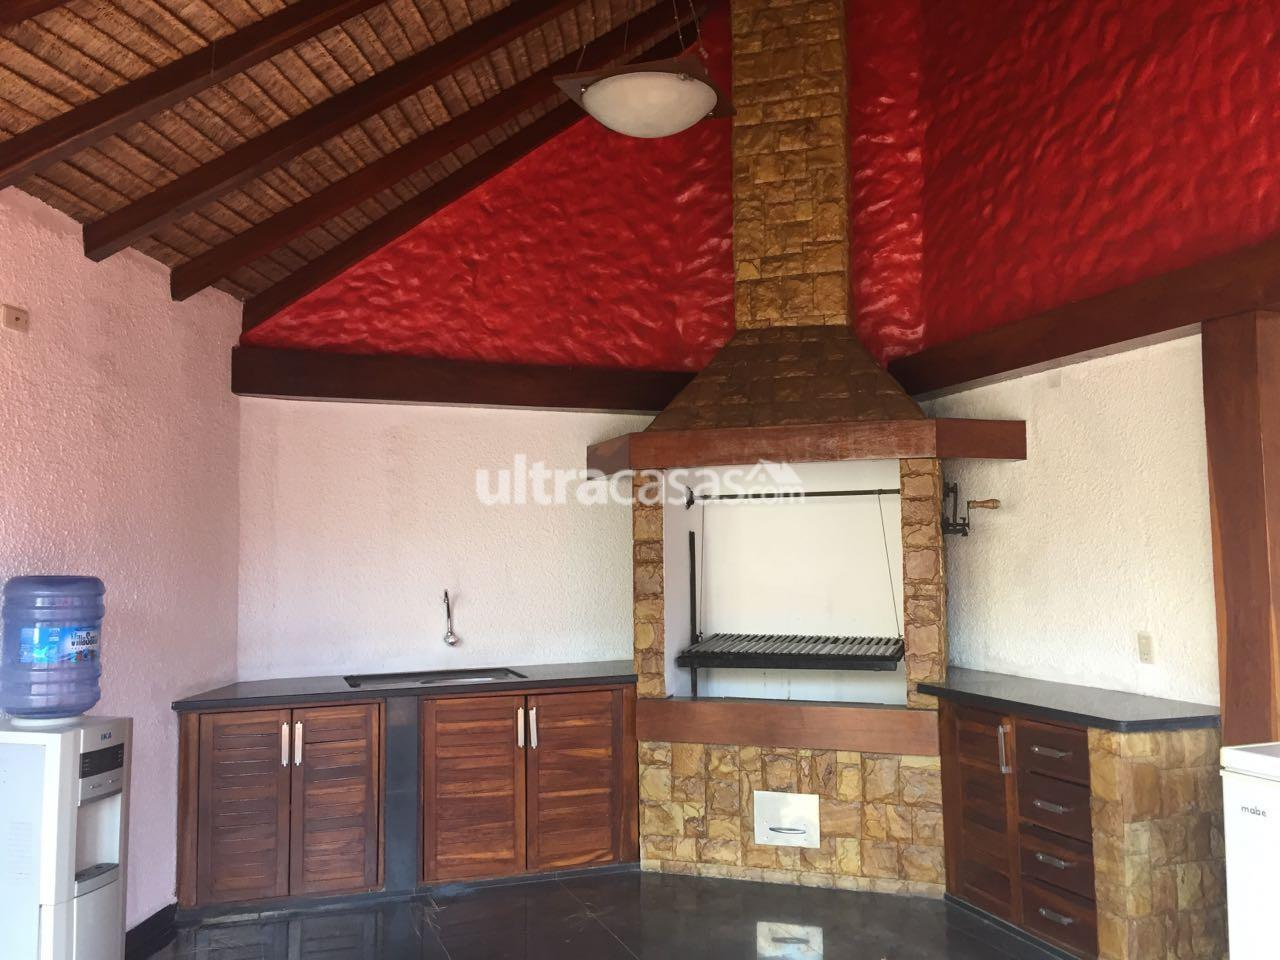 Casa en Venta Av. Banzer km, 10, condominio Sevilla Las Terazas I, calle San Pedro Oeste 24. Foto 14